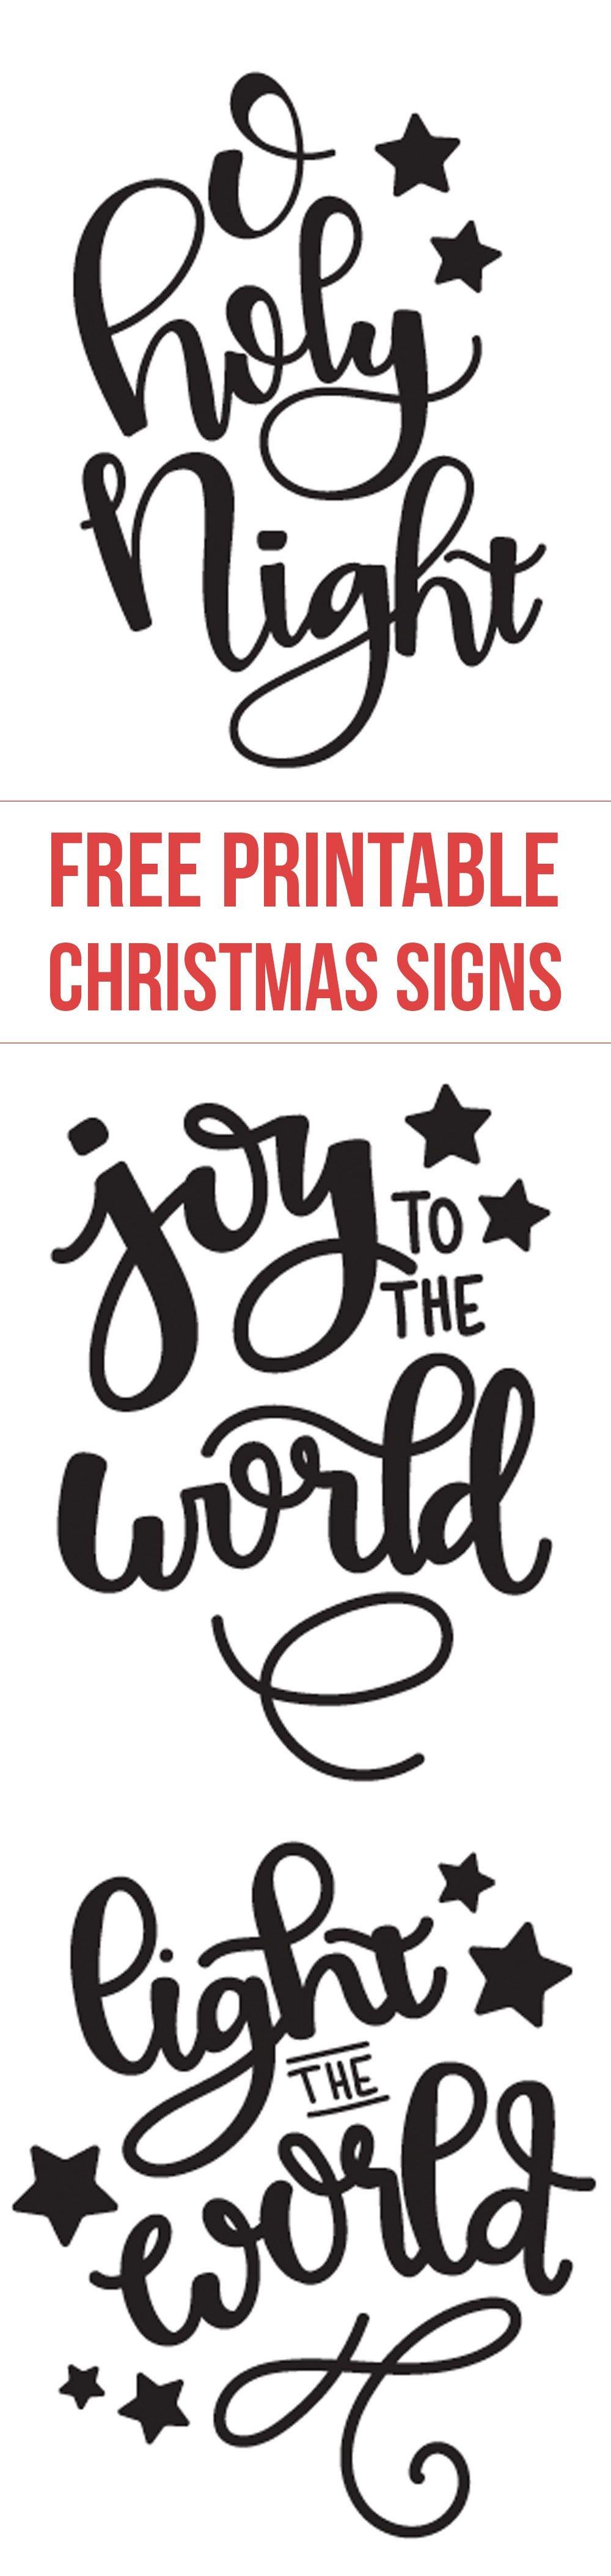 Light The World Designs   Live It. Love It. Lds.   Free Christmas - Free Printable Christmas Designs